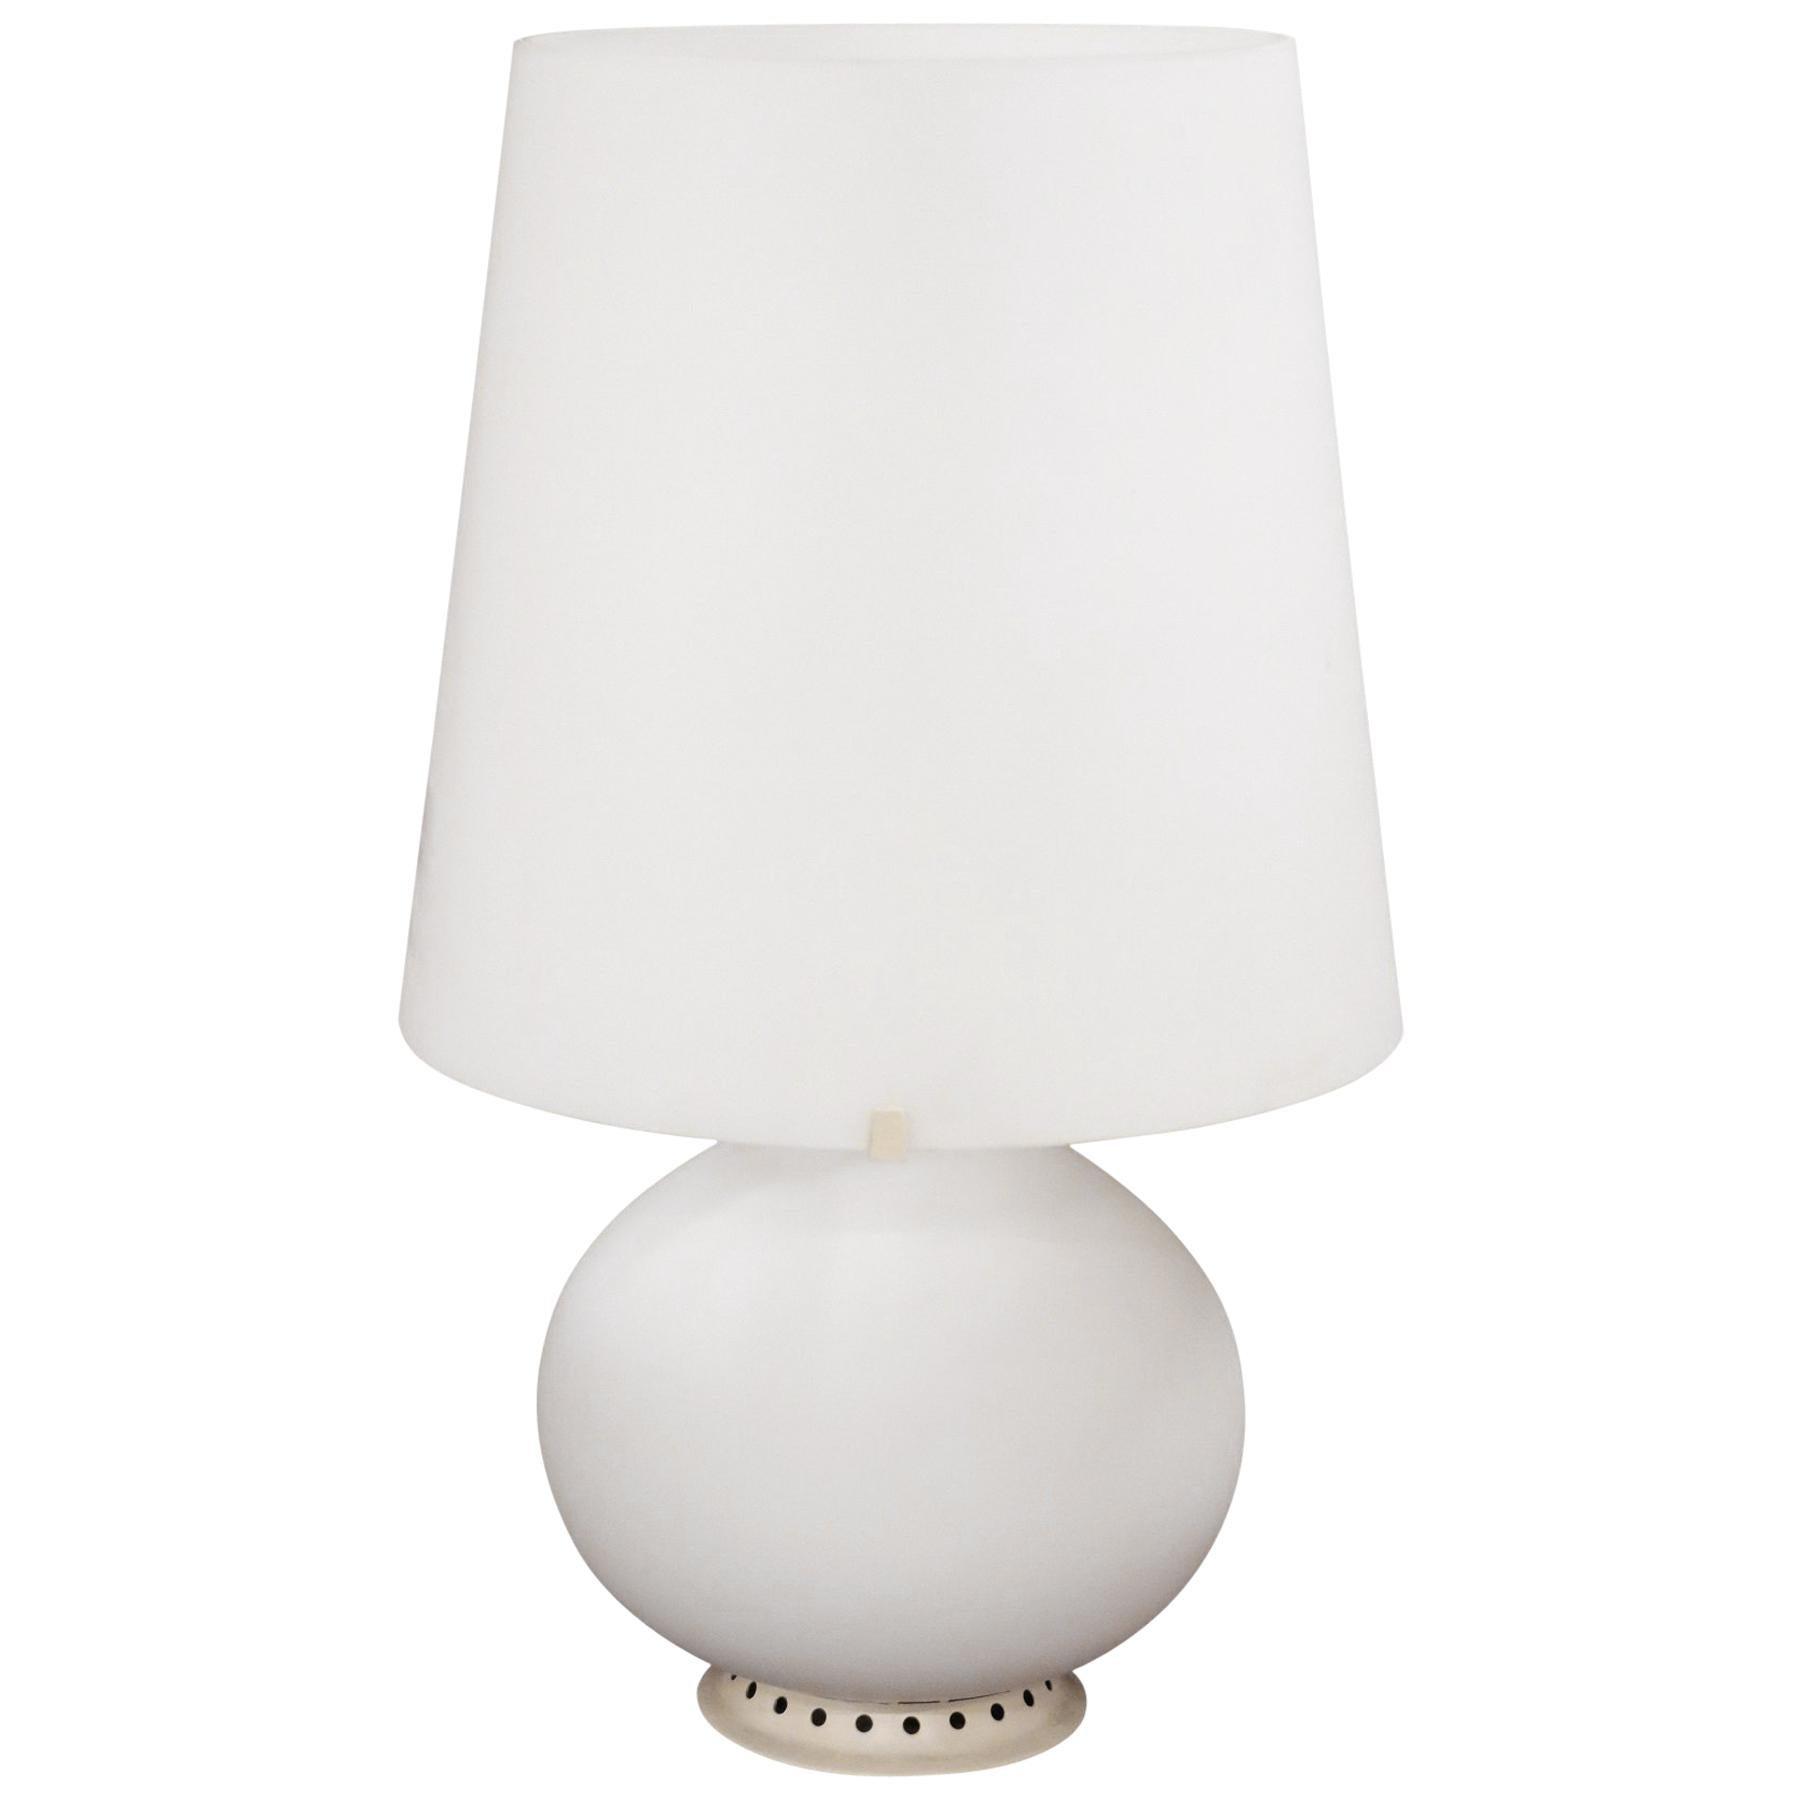 Arte1954 Lamp Fontana By Max 20th Century For Italian Design Table Ingrad gIf7yvmbY6